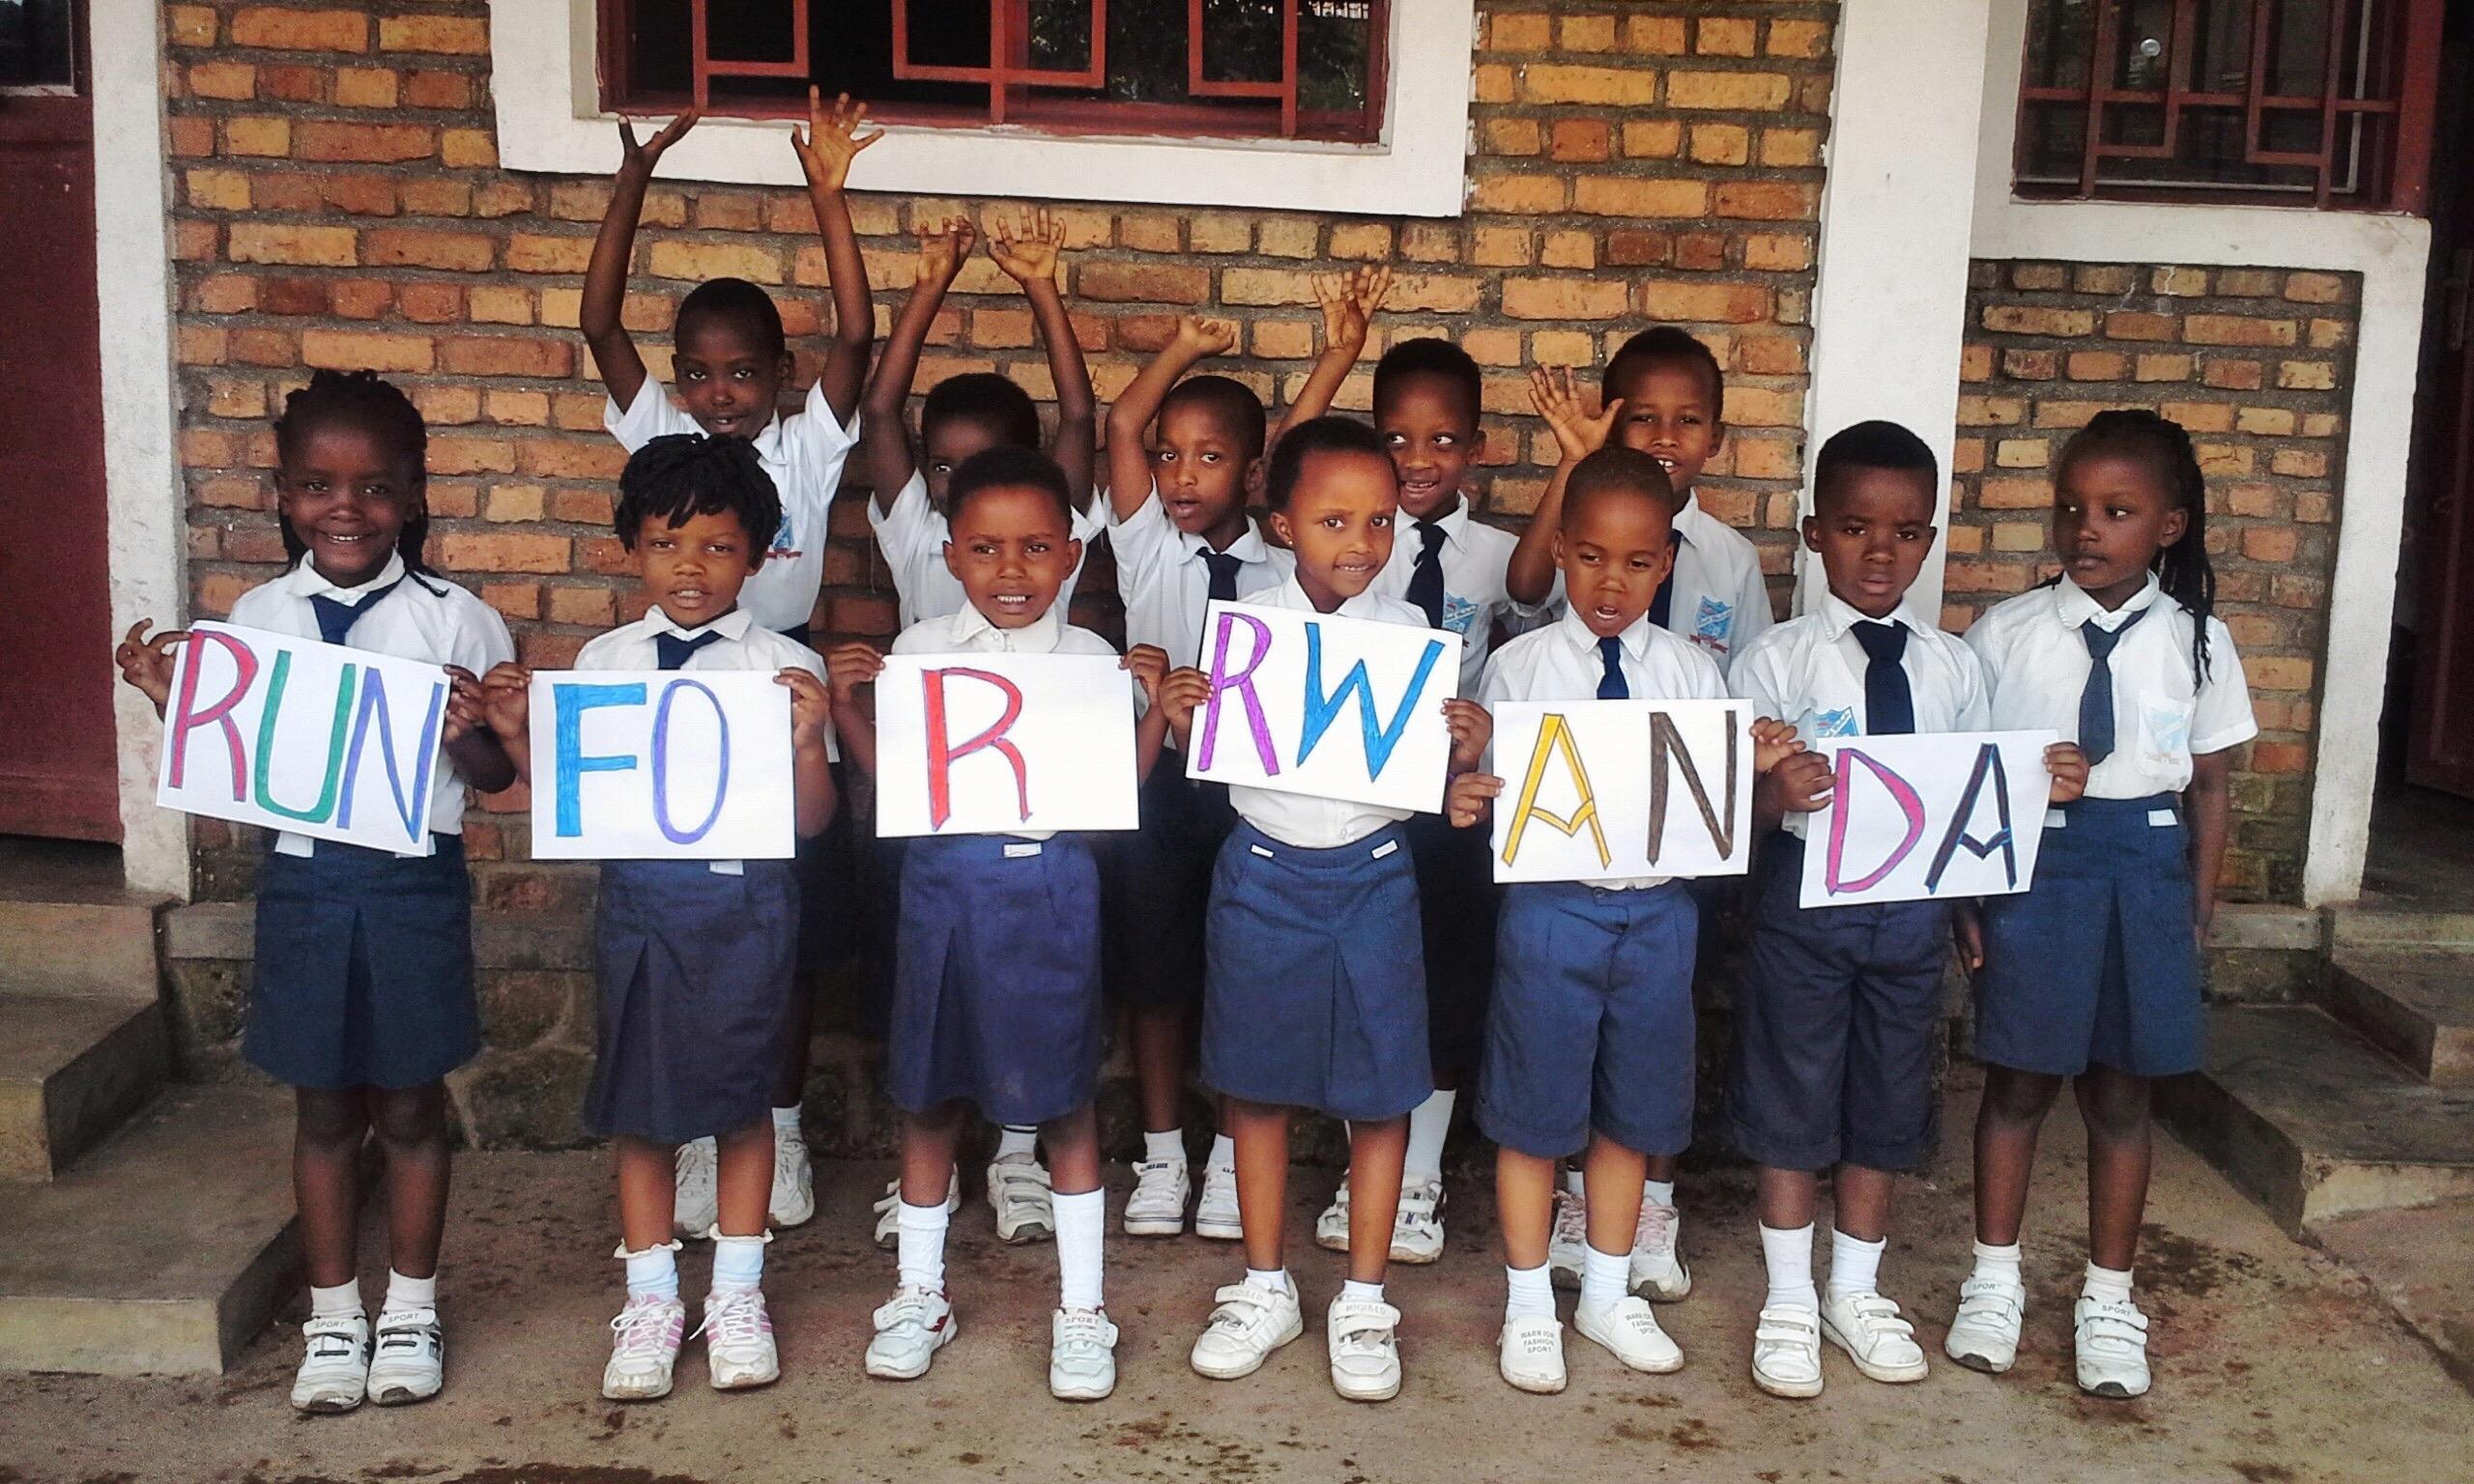 RUN for RUANDA-Sponsorenlauf